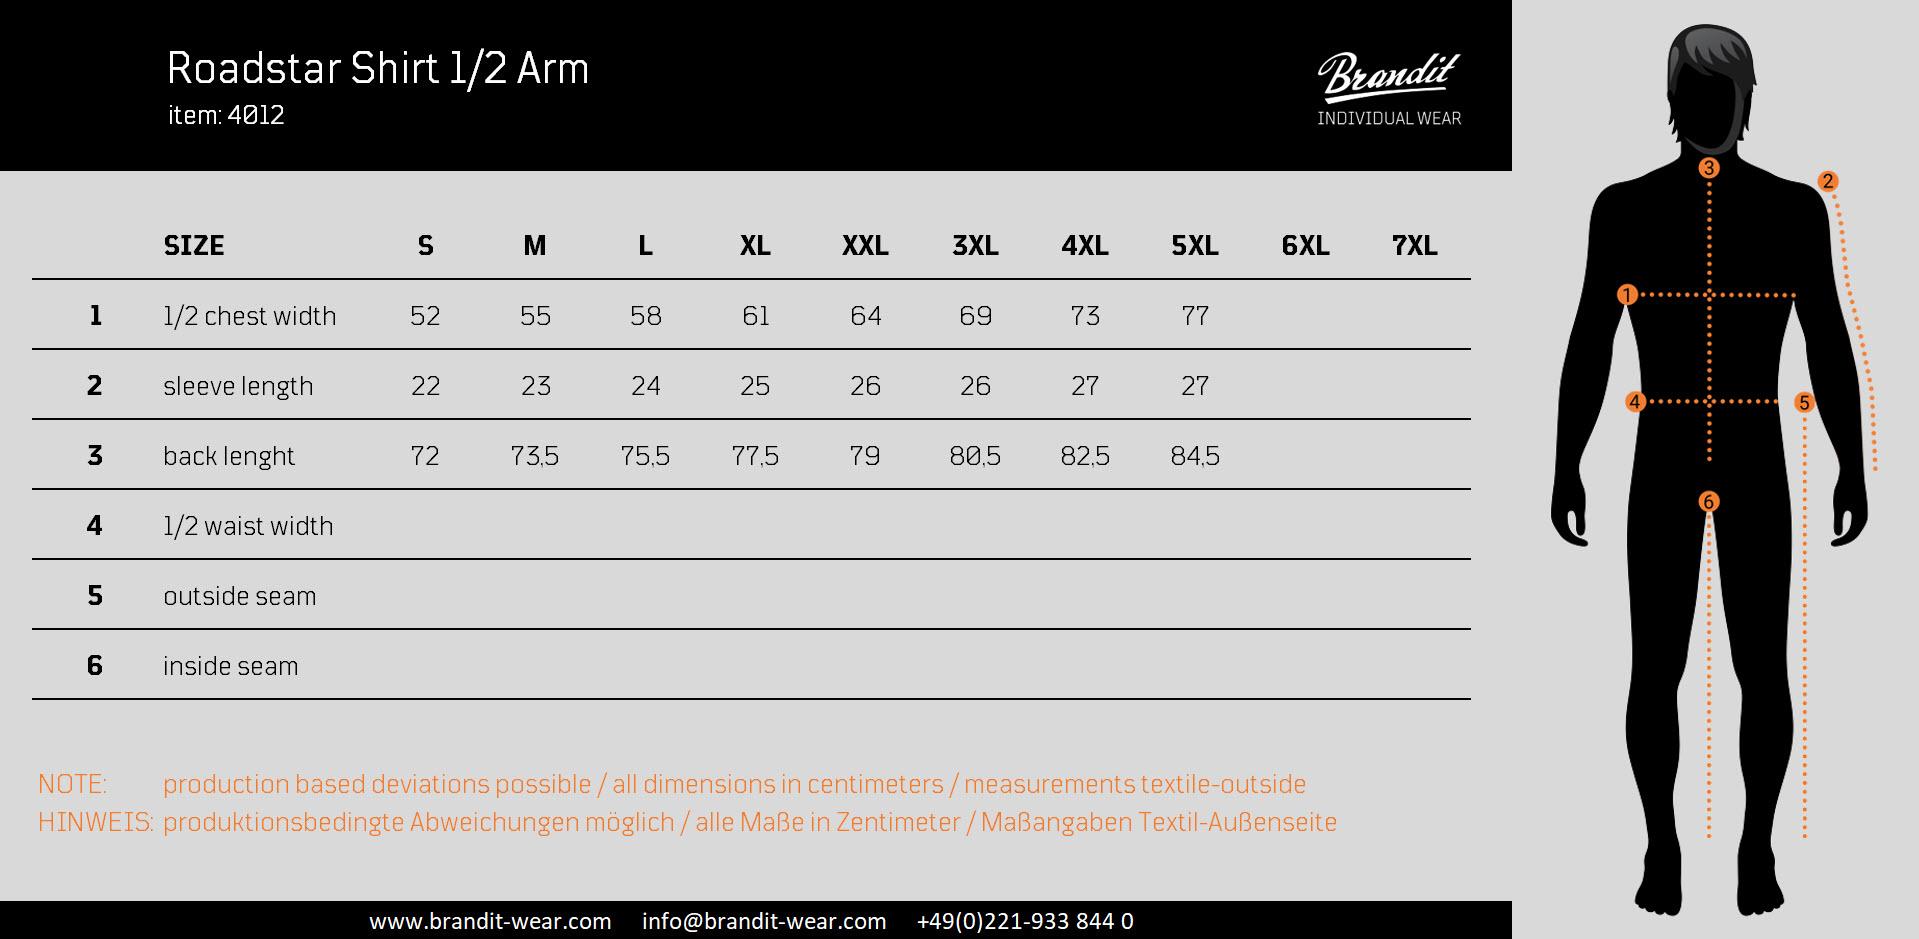 4012-Roadstar-Shirt-1-2-Arm